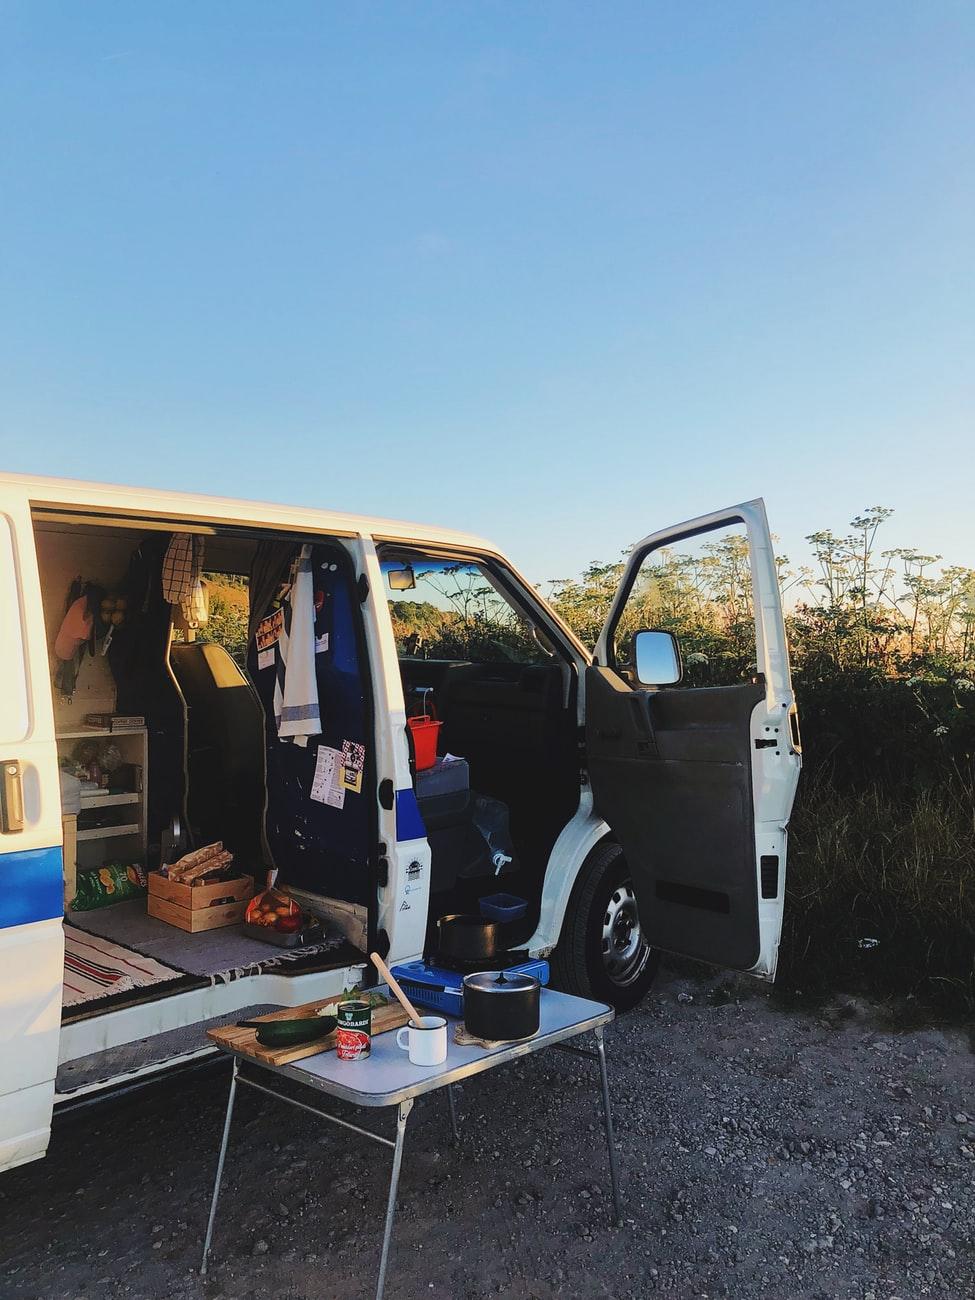 préparer votre voyage en camping-car